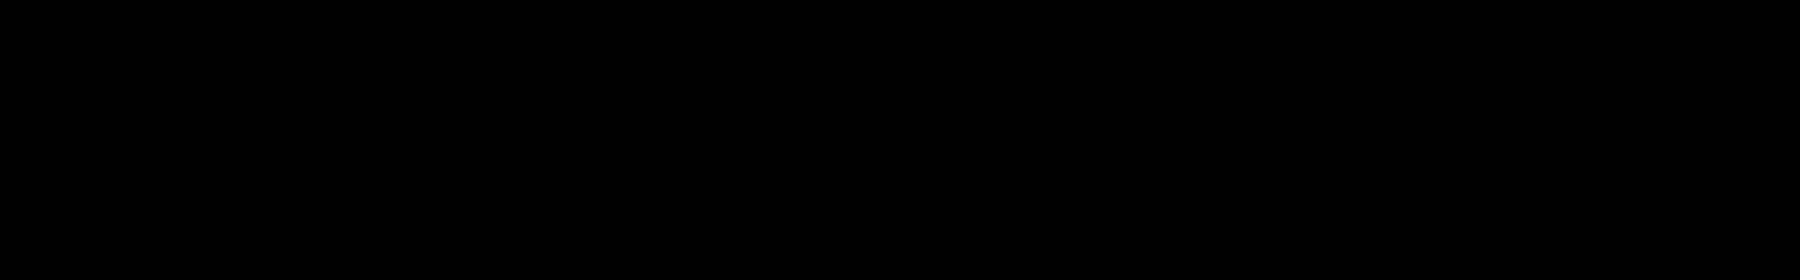 Moombahton audio waveform